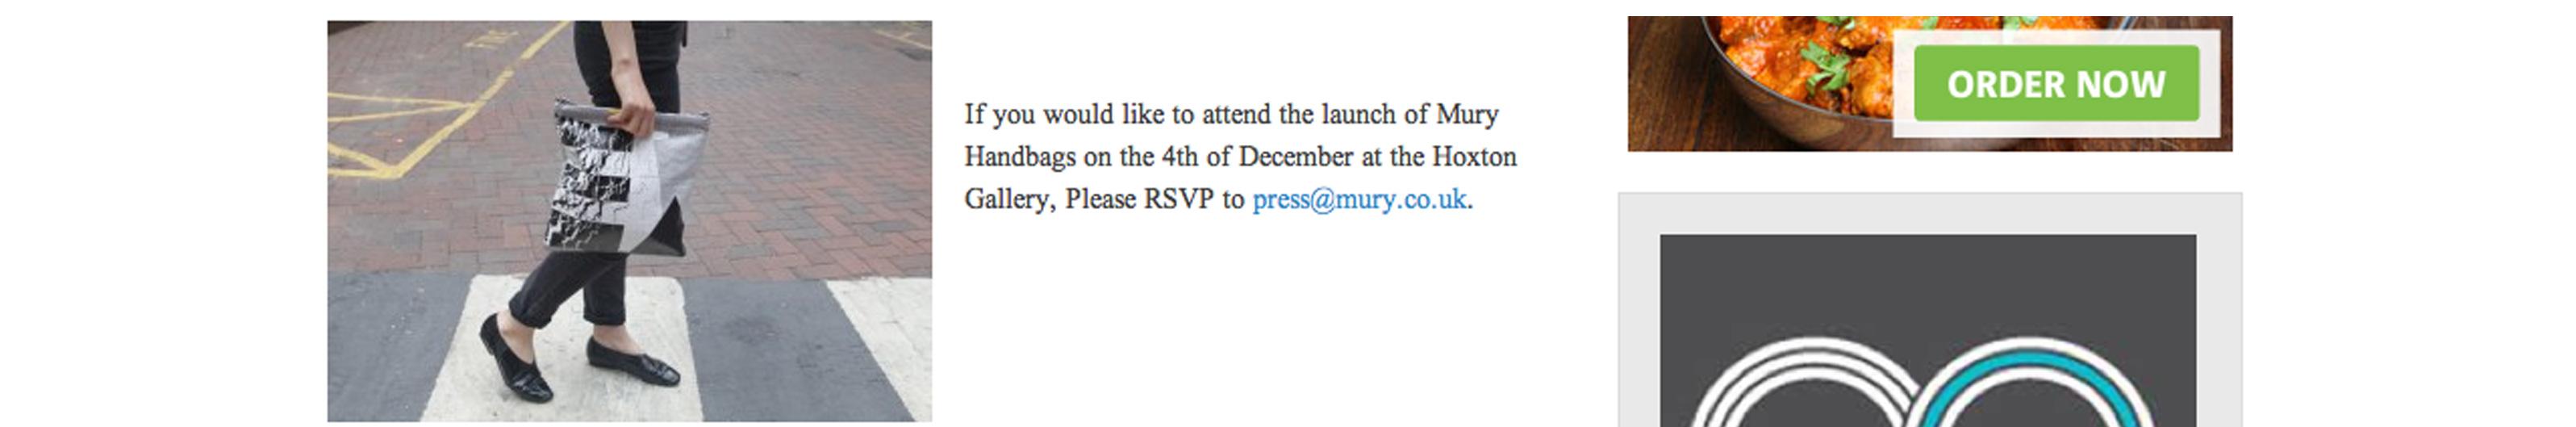 Mury-Made-in-Shoreditch-Nov-2013-p3